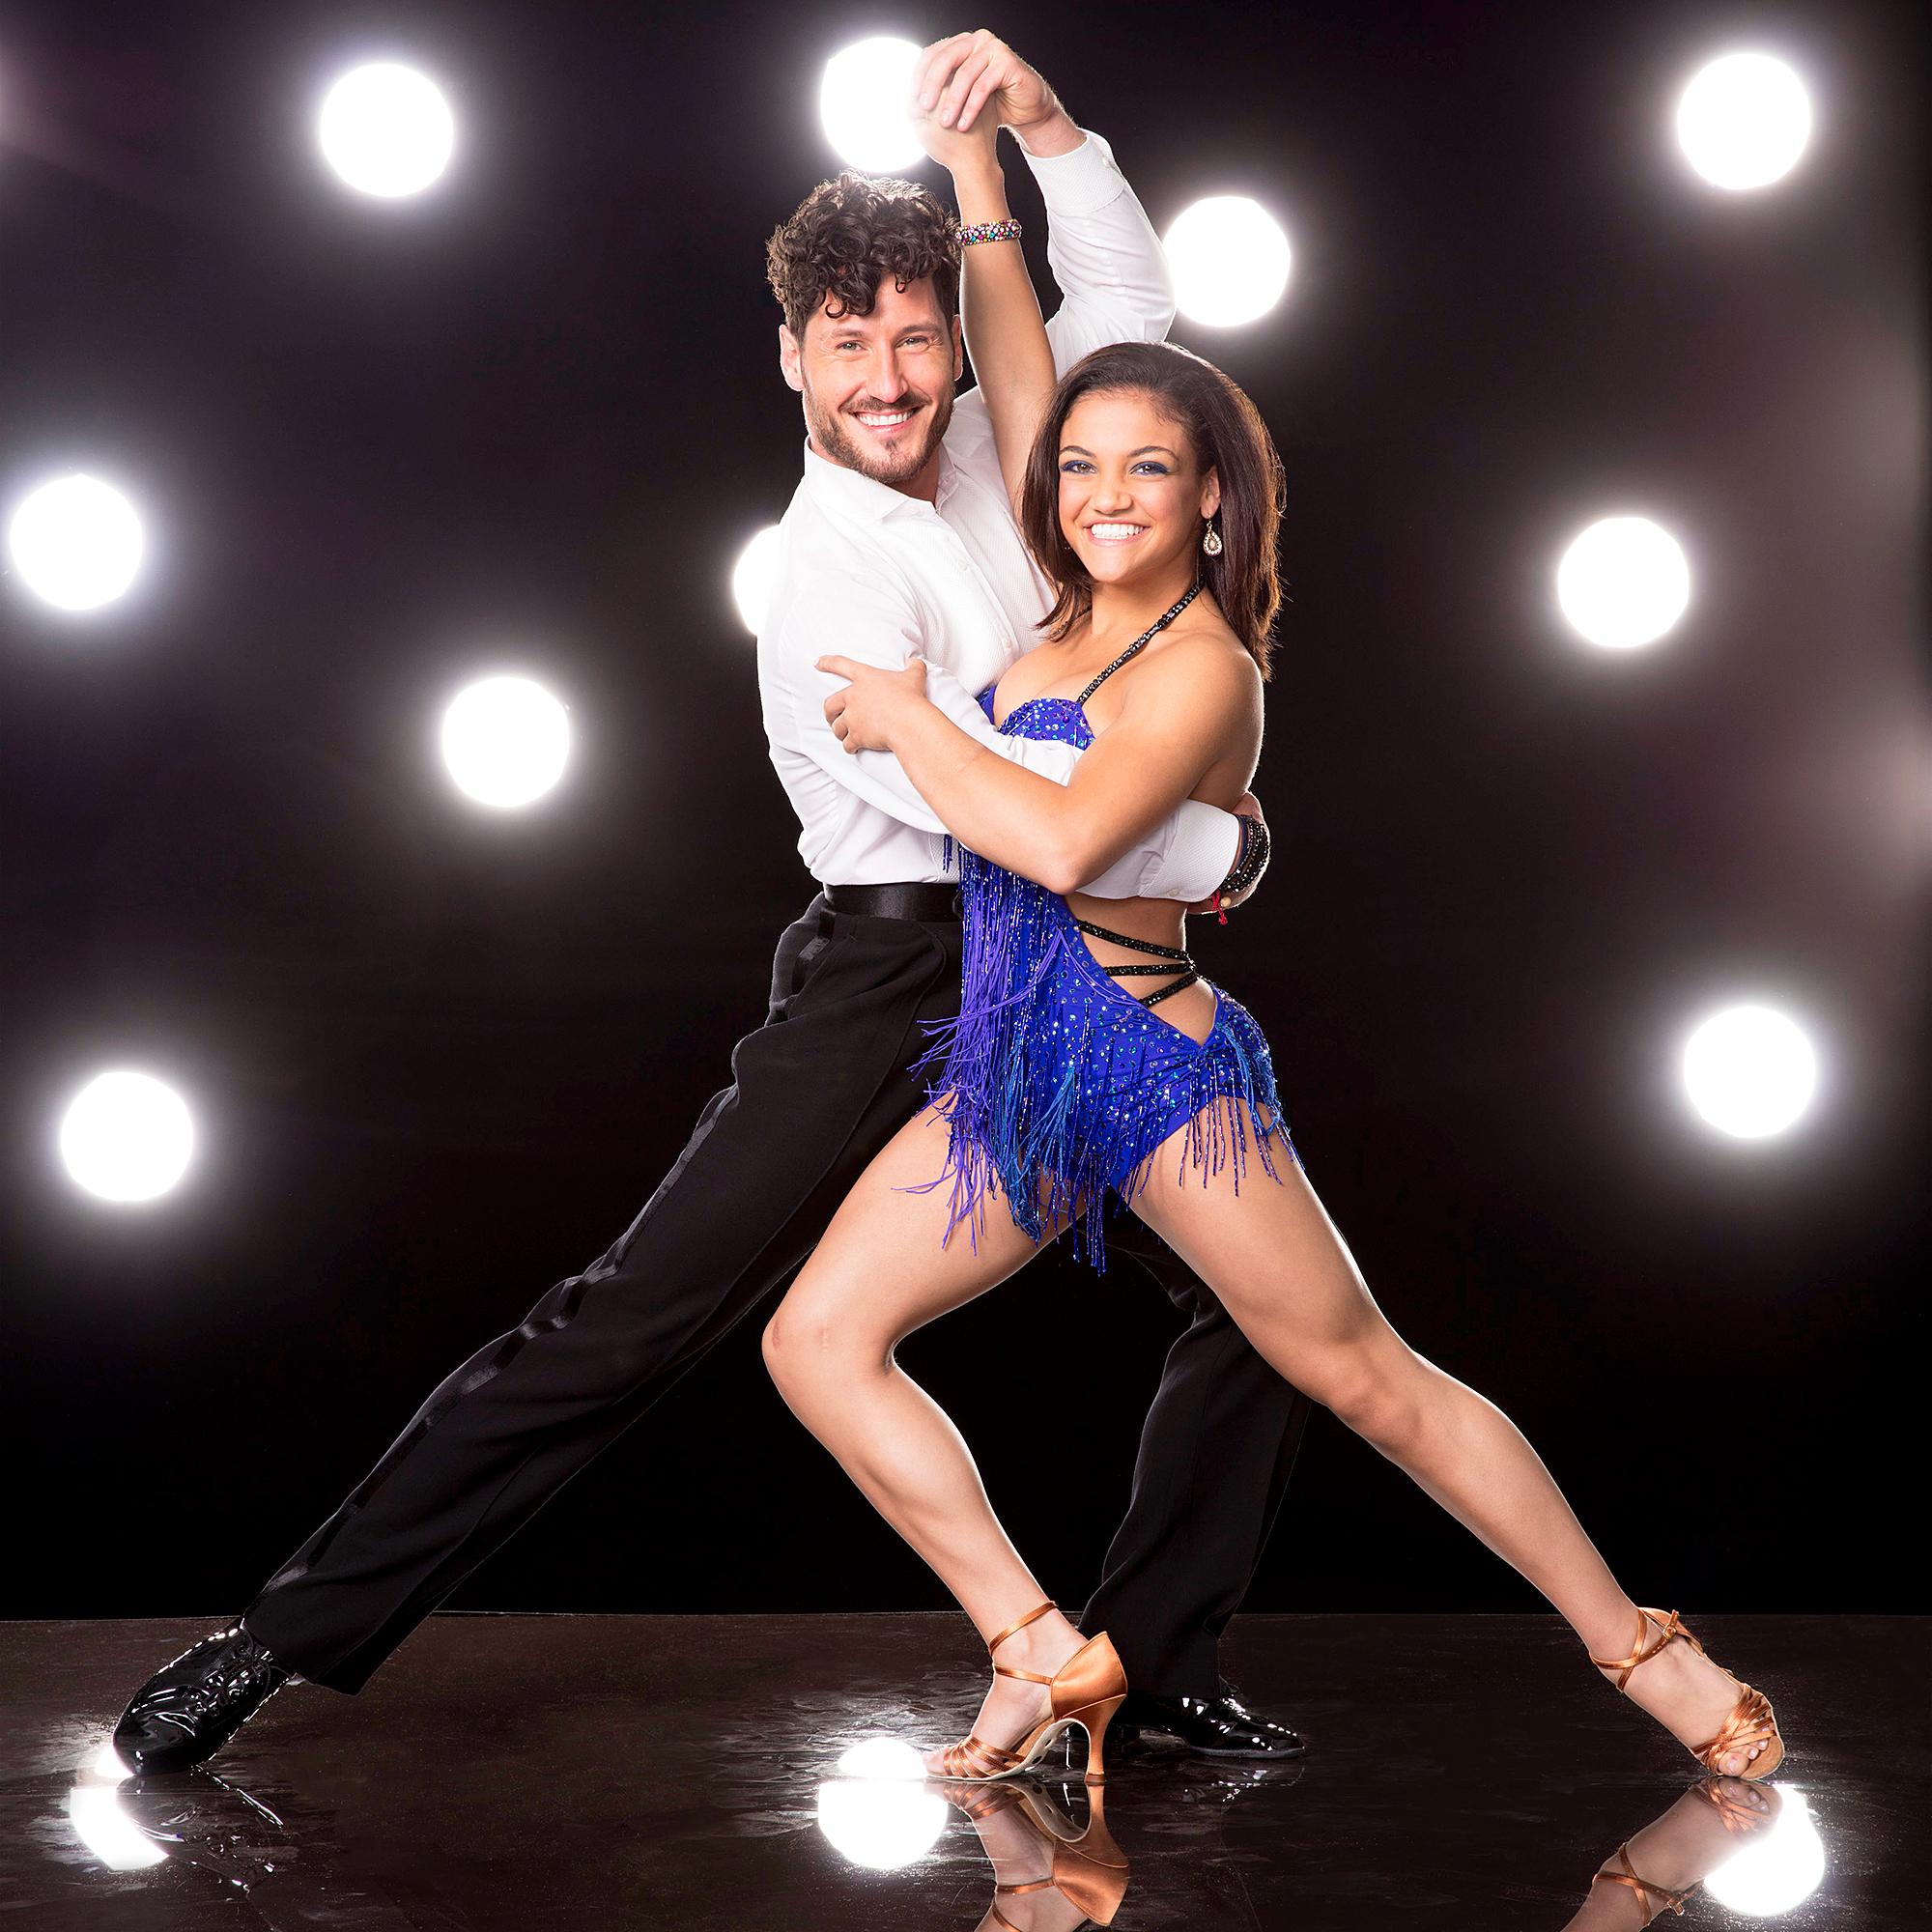 Val Chmerkovskiy and Laurie Hernandez